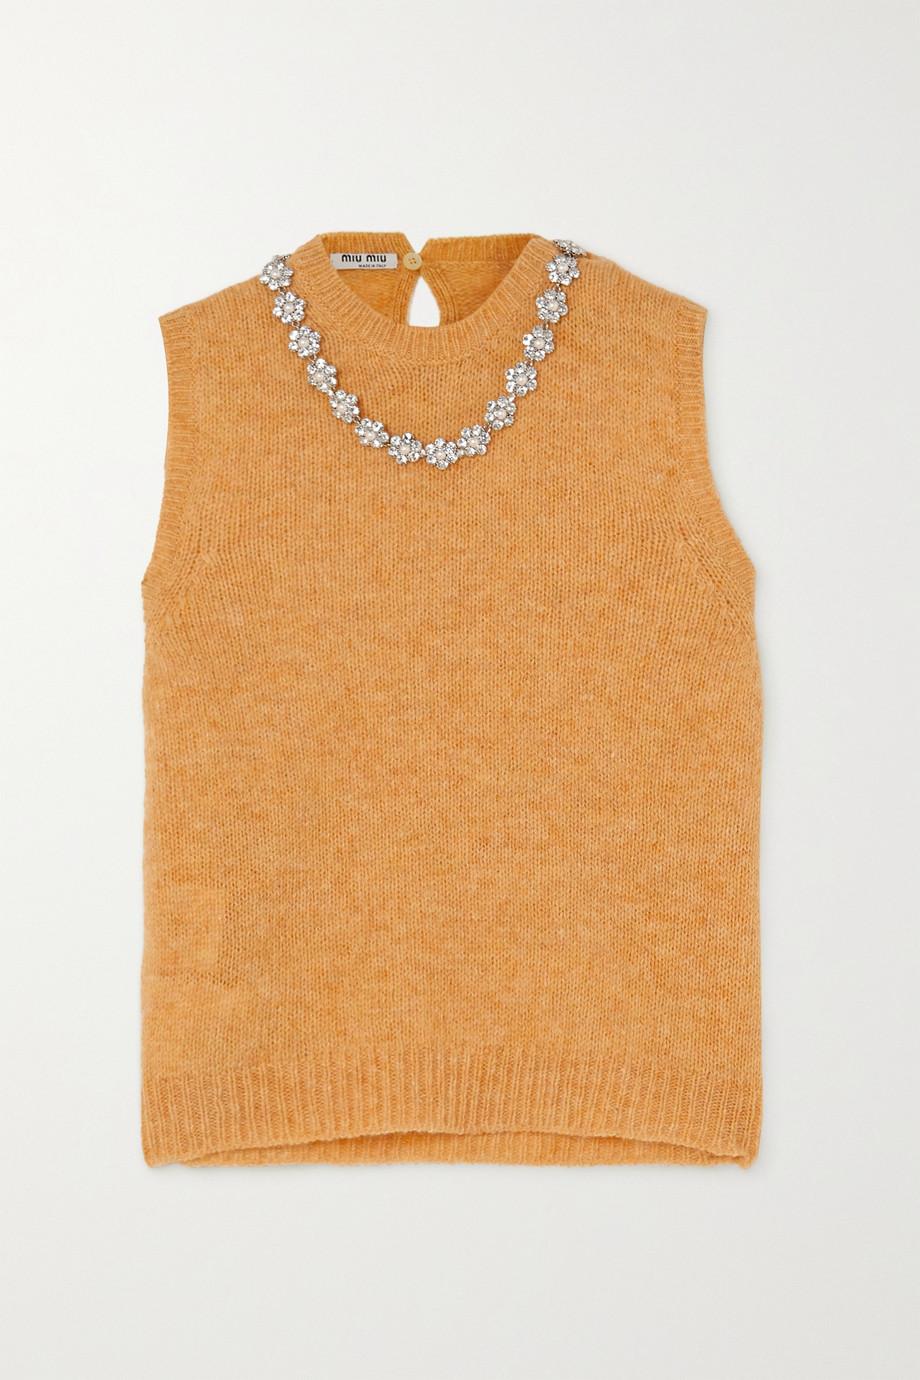 Miu Miu Crystal-embellished wool tank